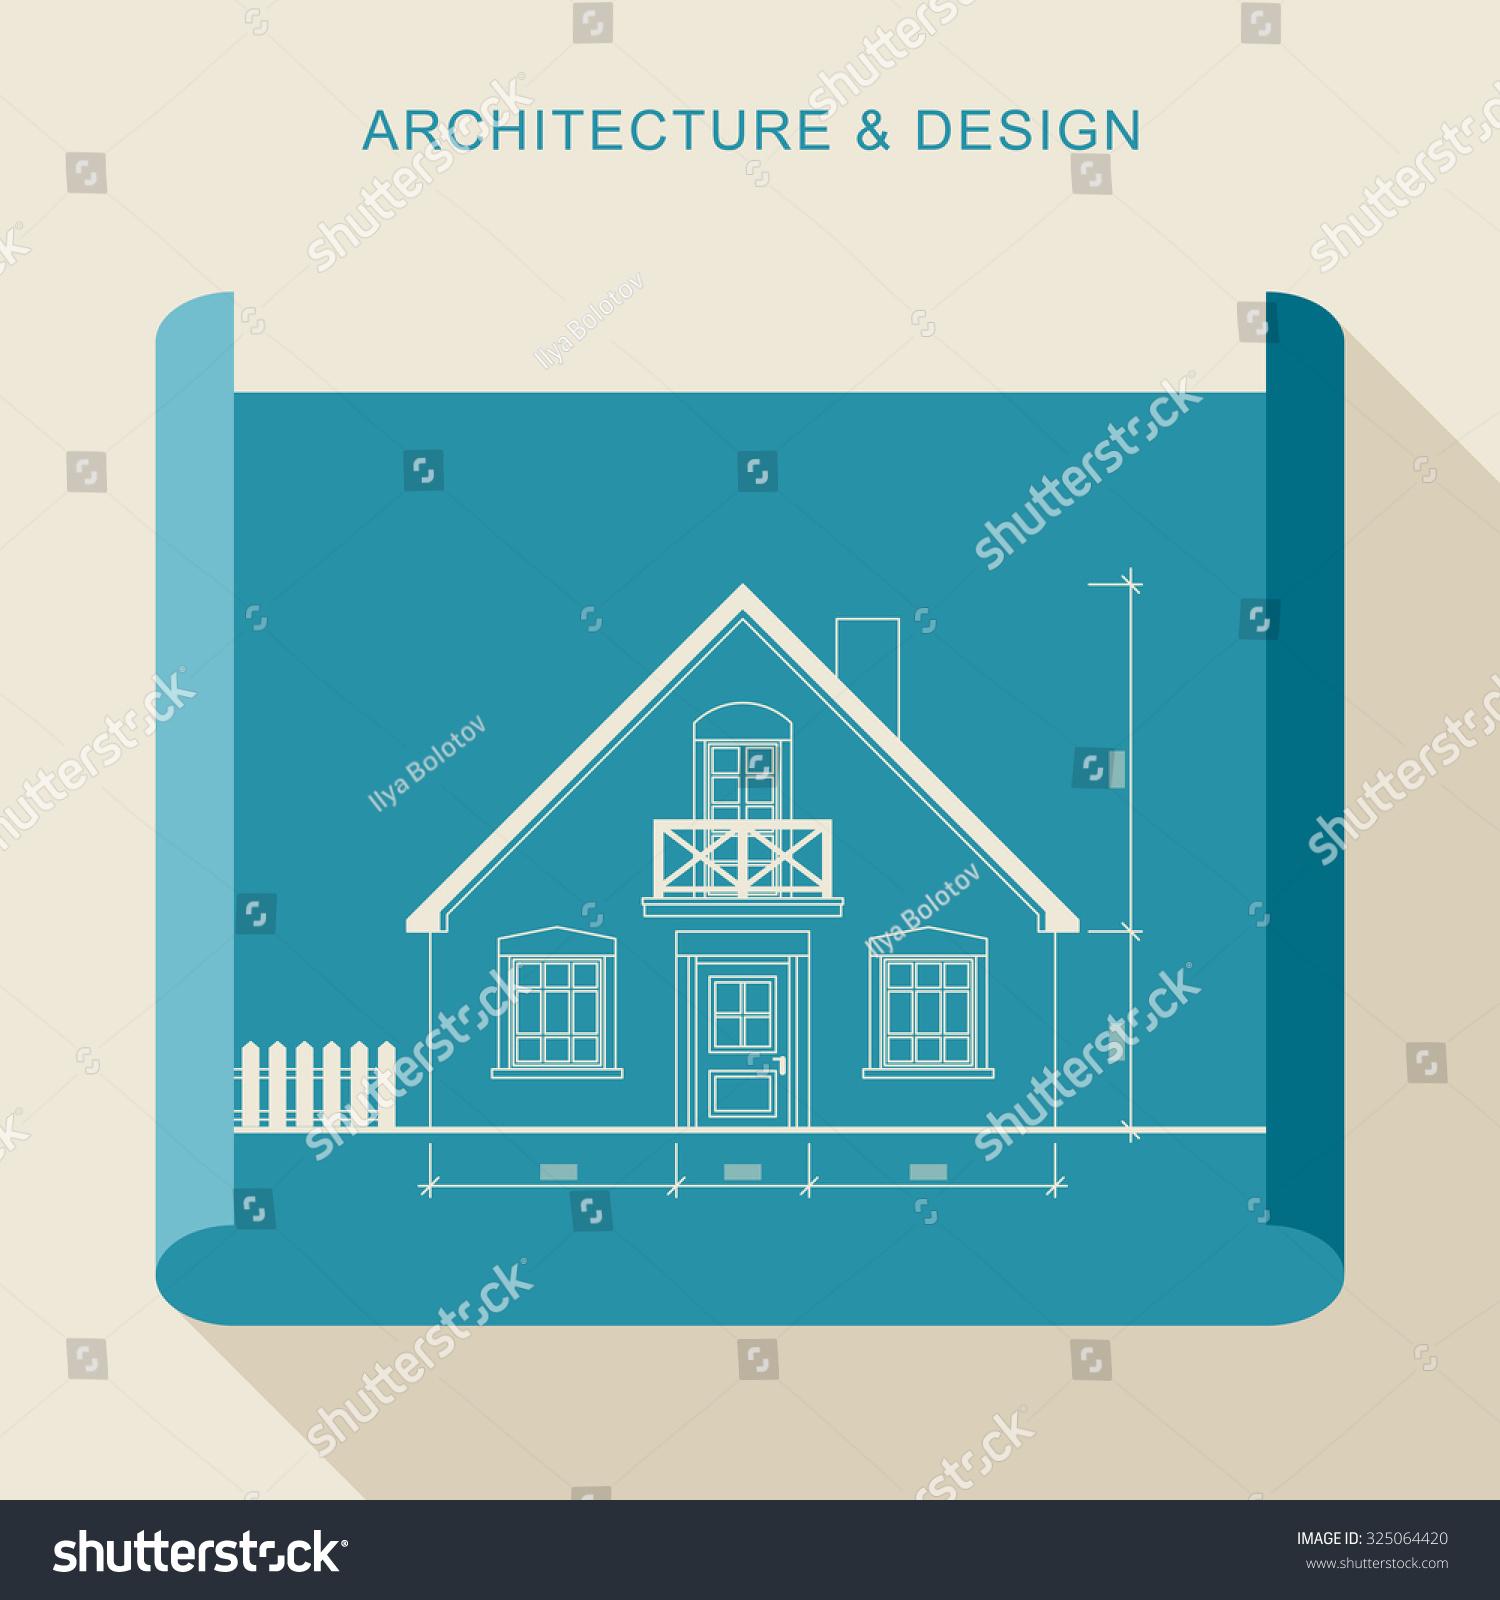 Architecture design simple flat illustration architectural for Flat architecture design